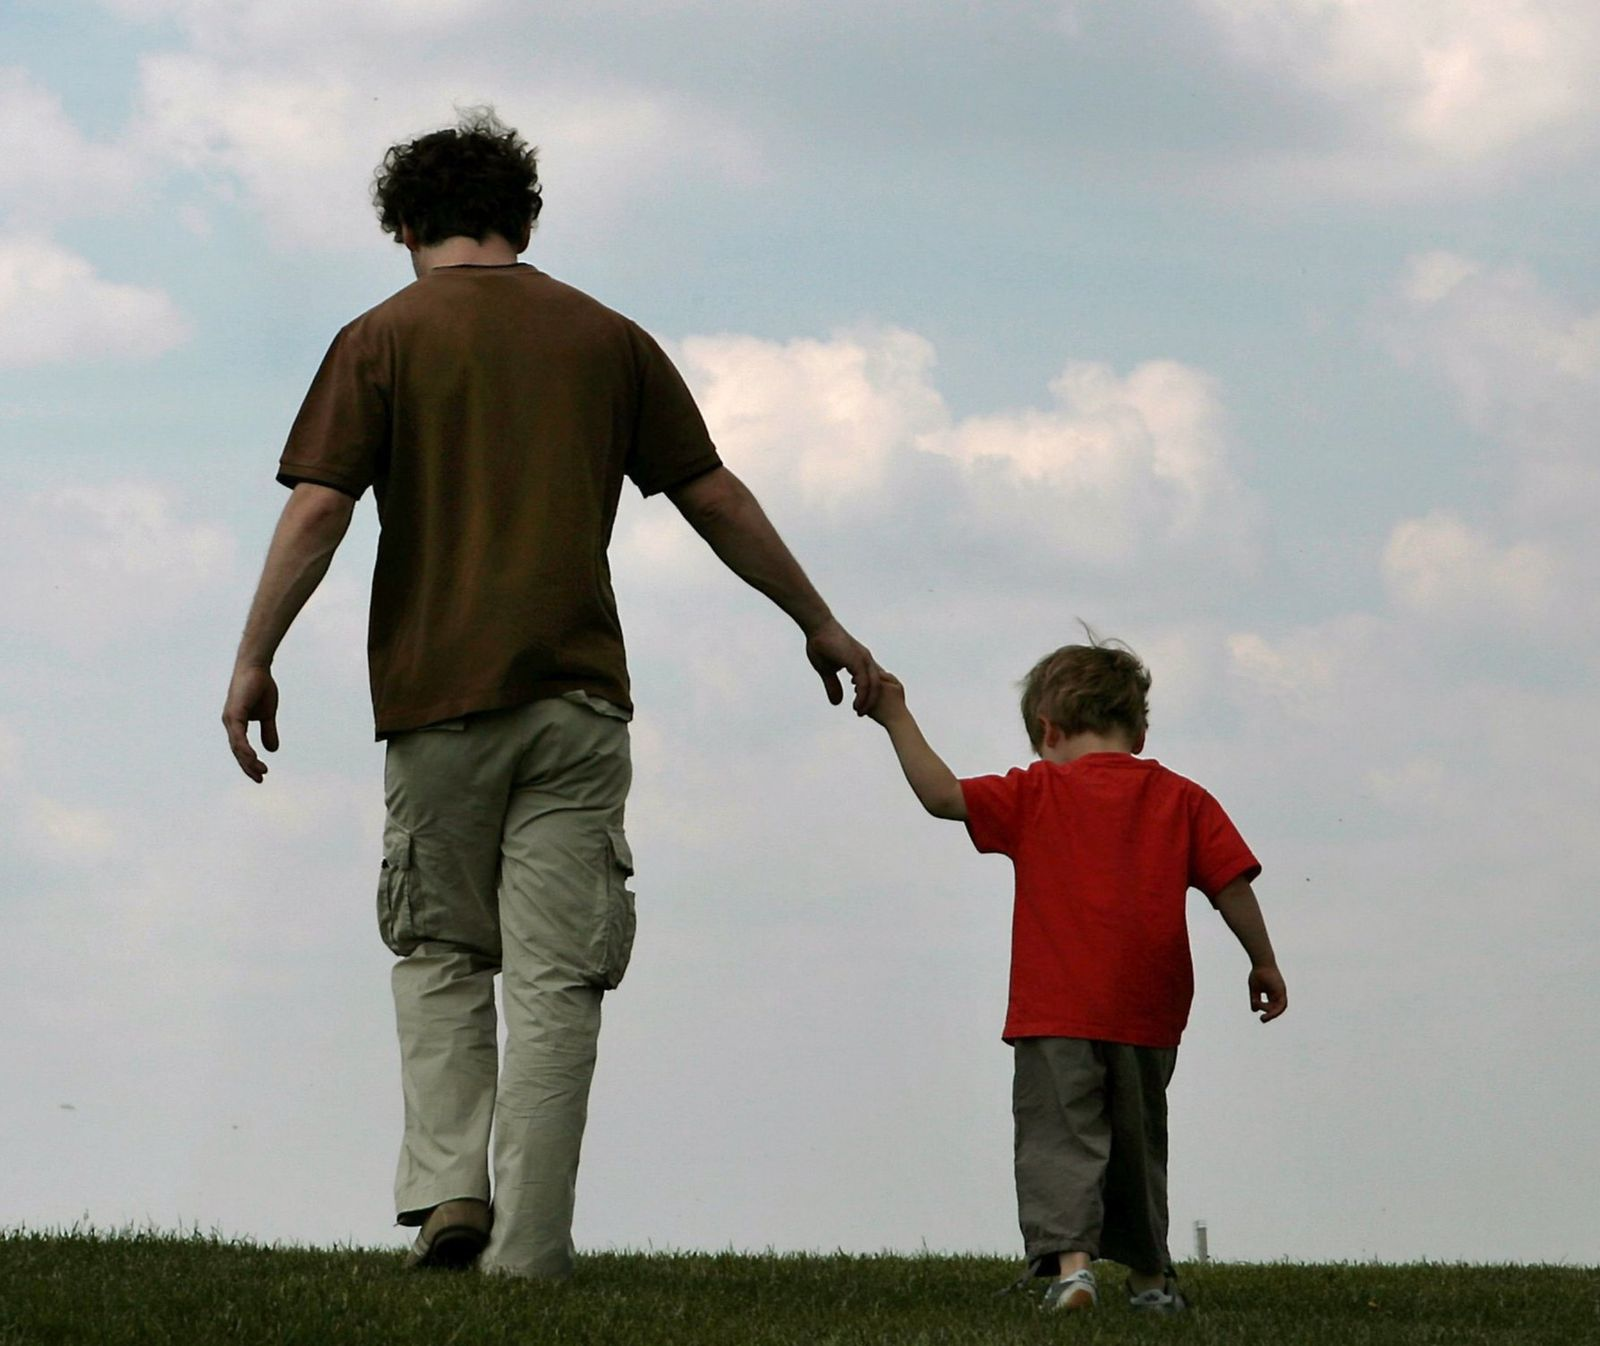 Vater und Sohn / Väter / Eltern